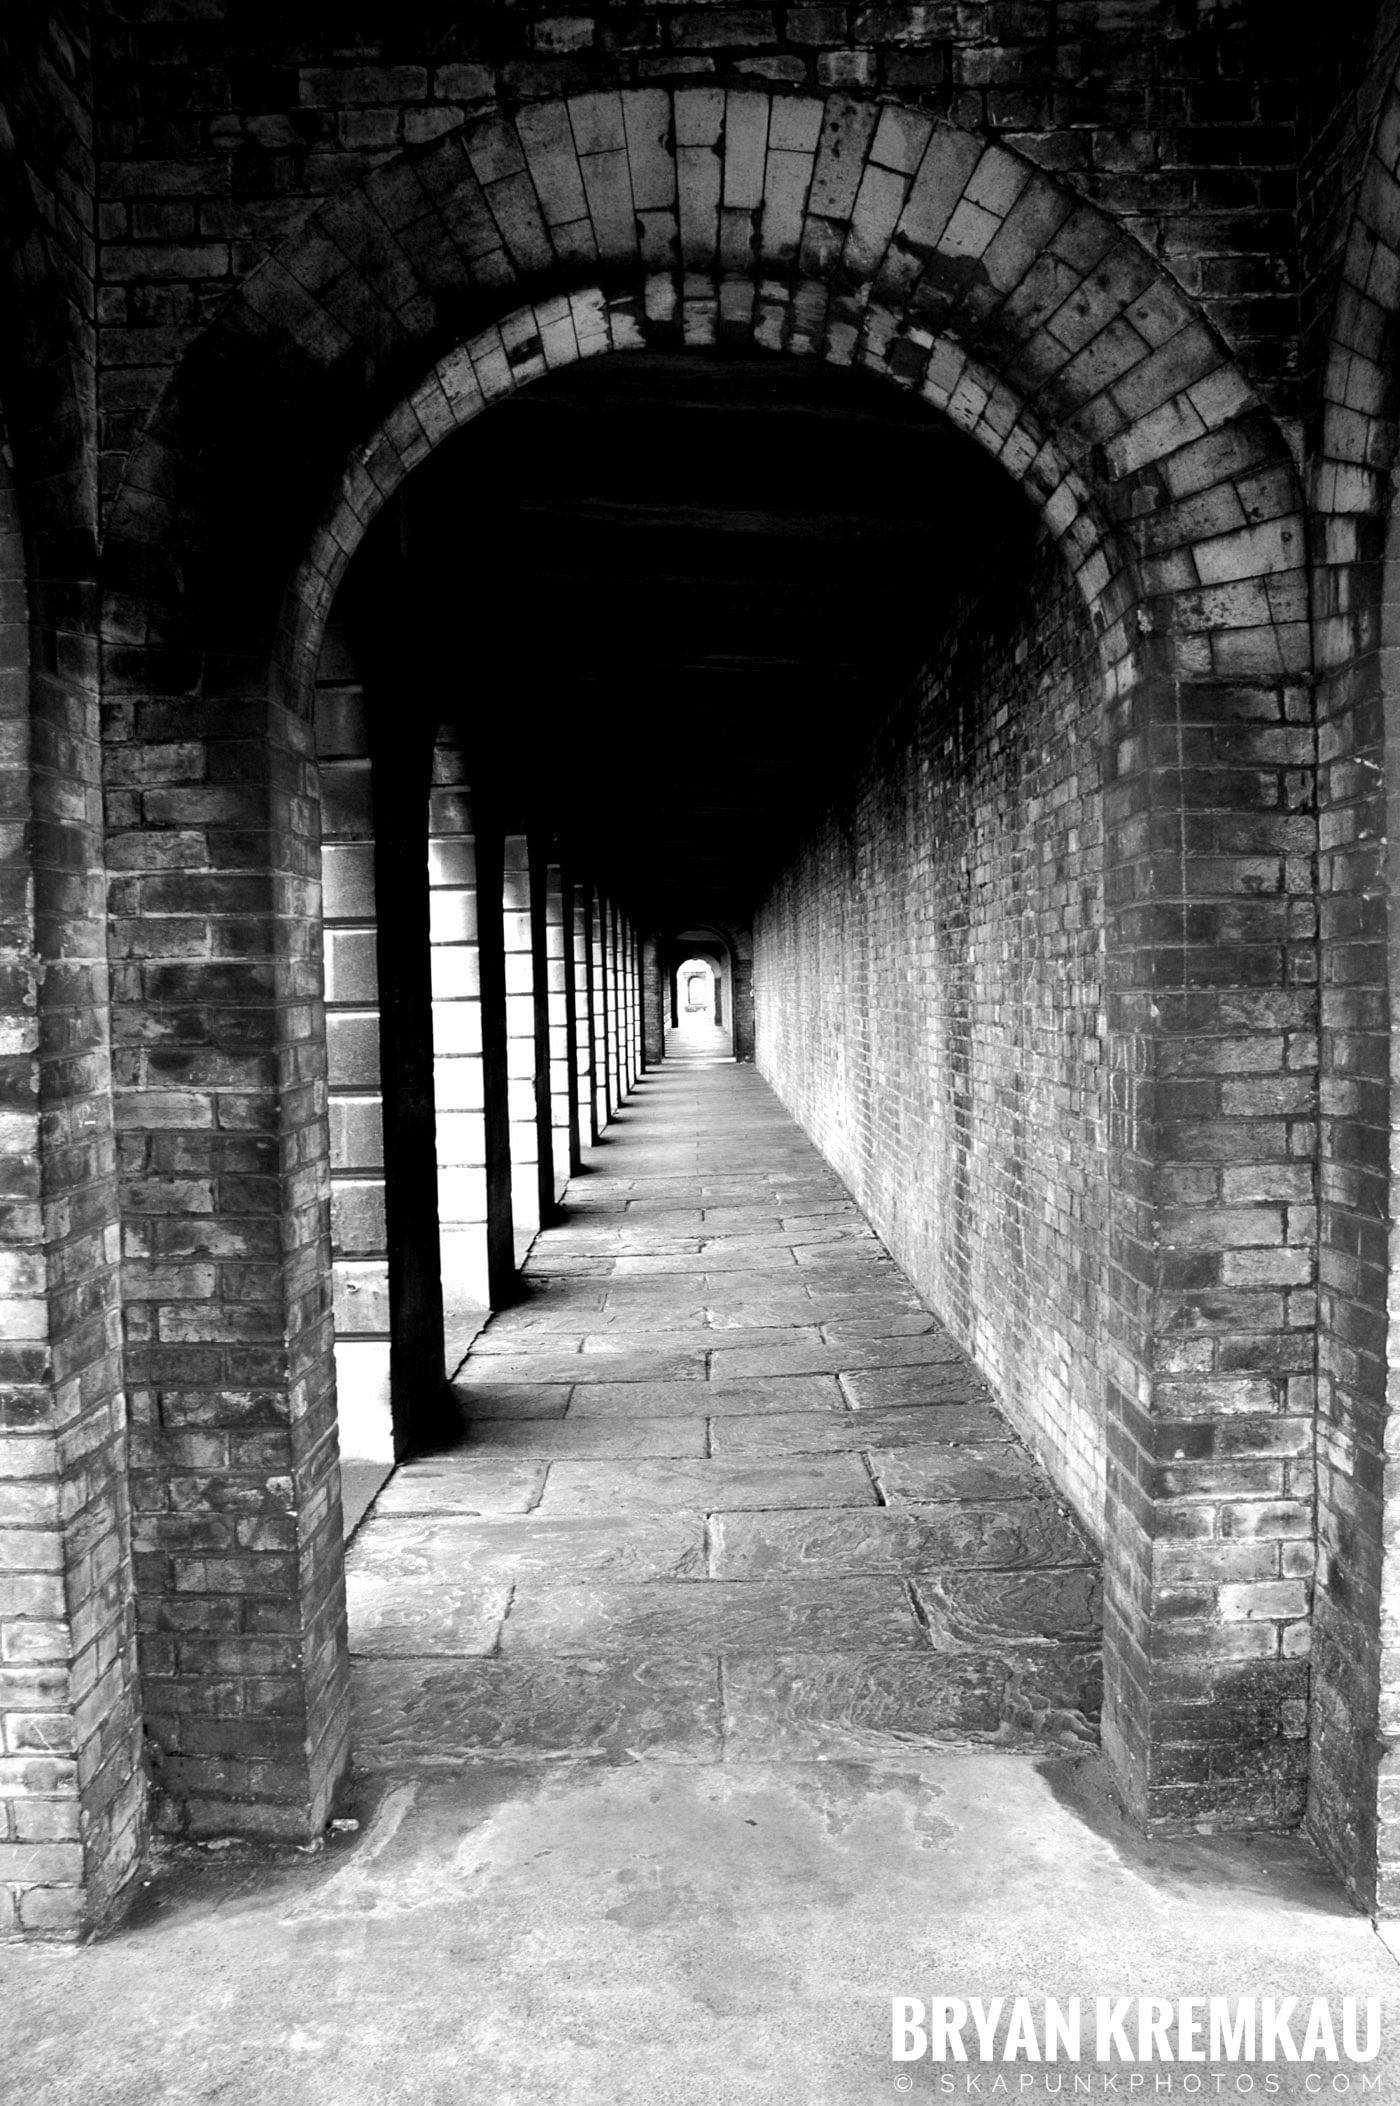 London, England - Day 2 - 12.17.05 (12)